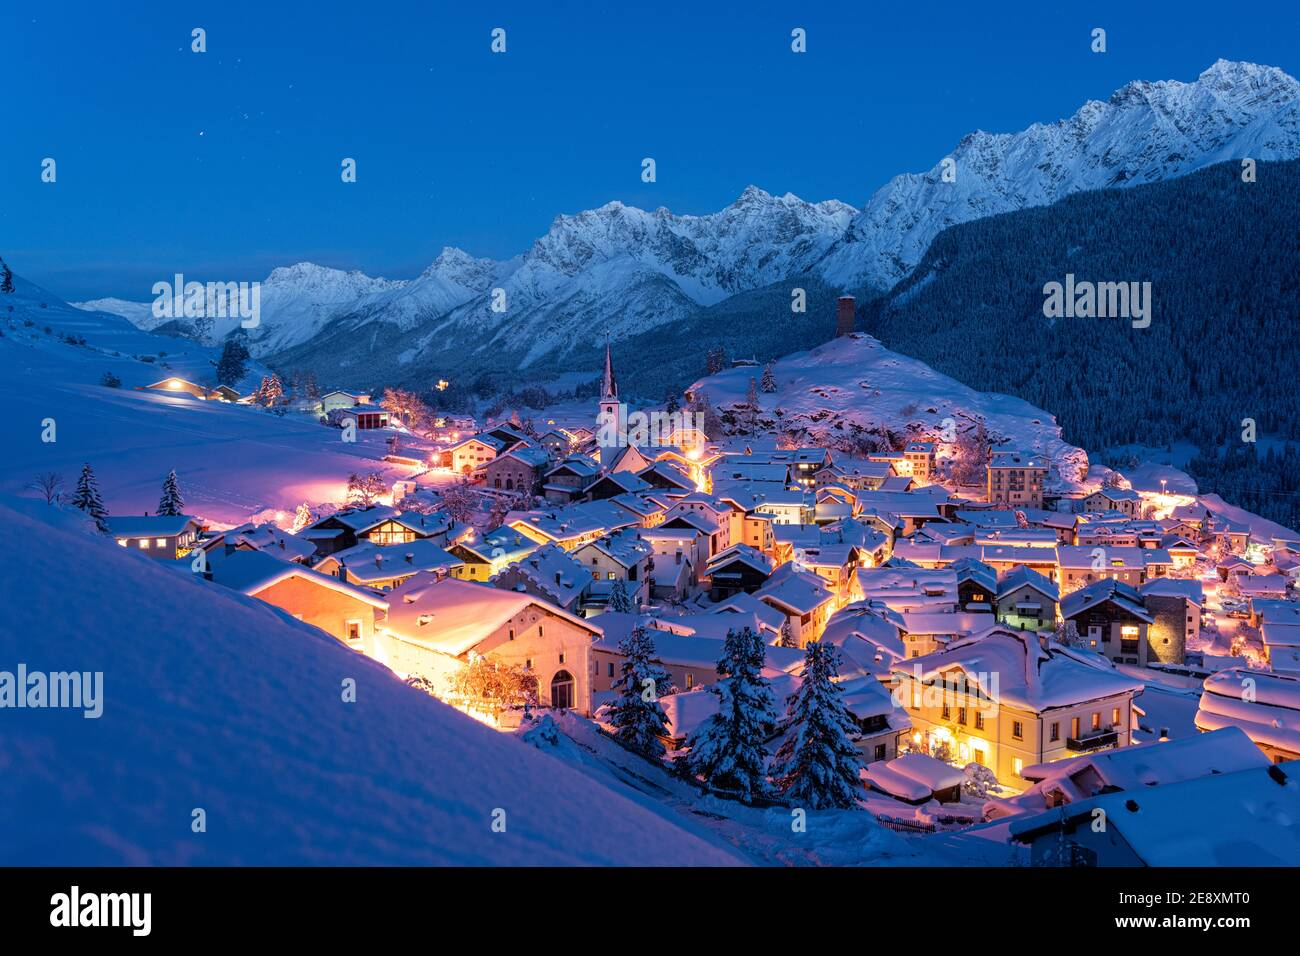 Traditional alpine village of Ardez covered with snow at dusk, canton of Graubunden, Engadine, Switzerland Stock Photo